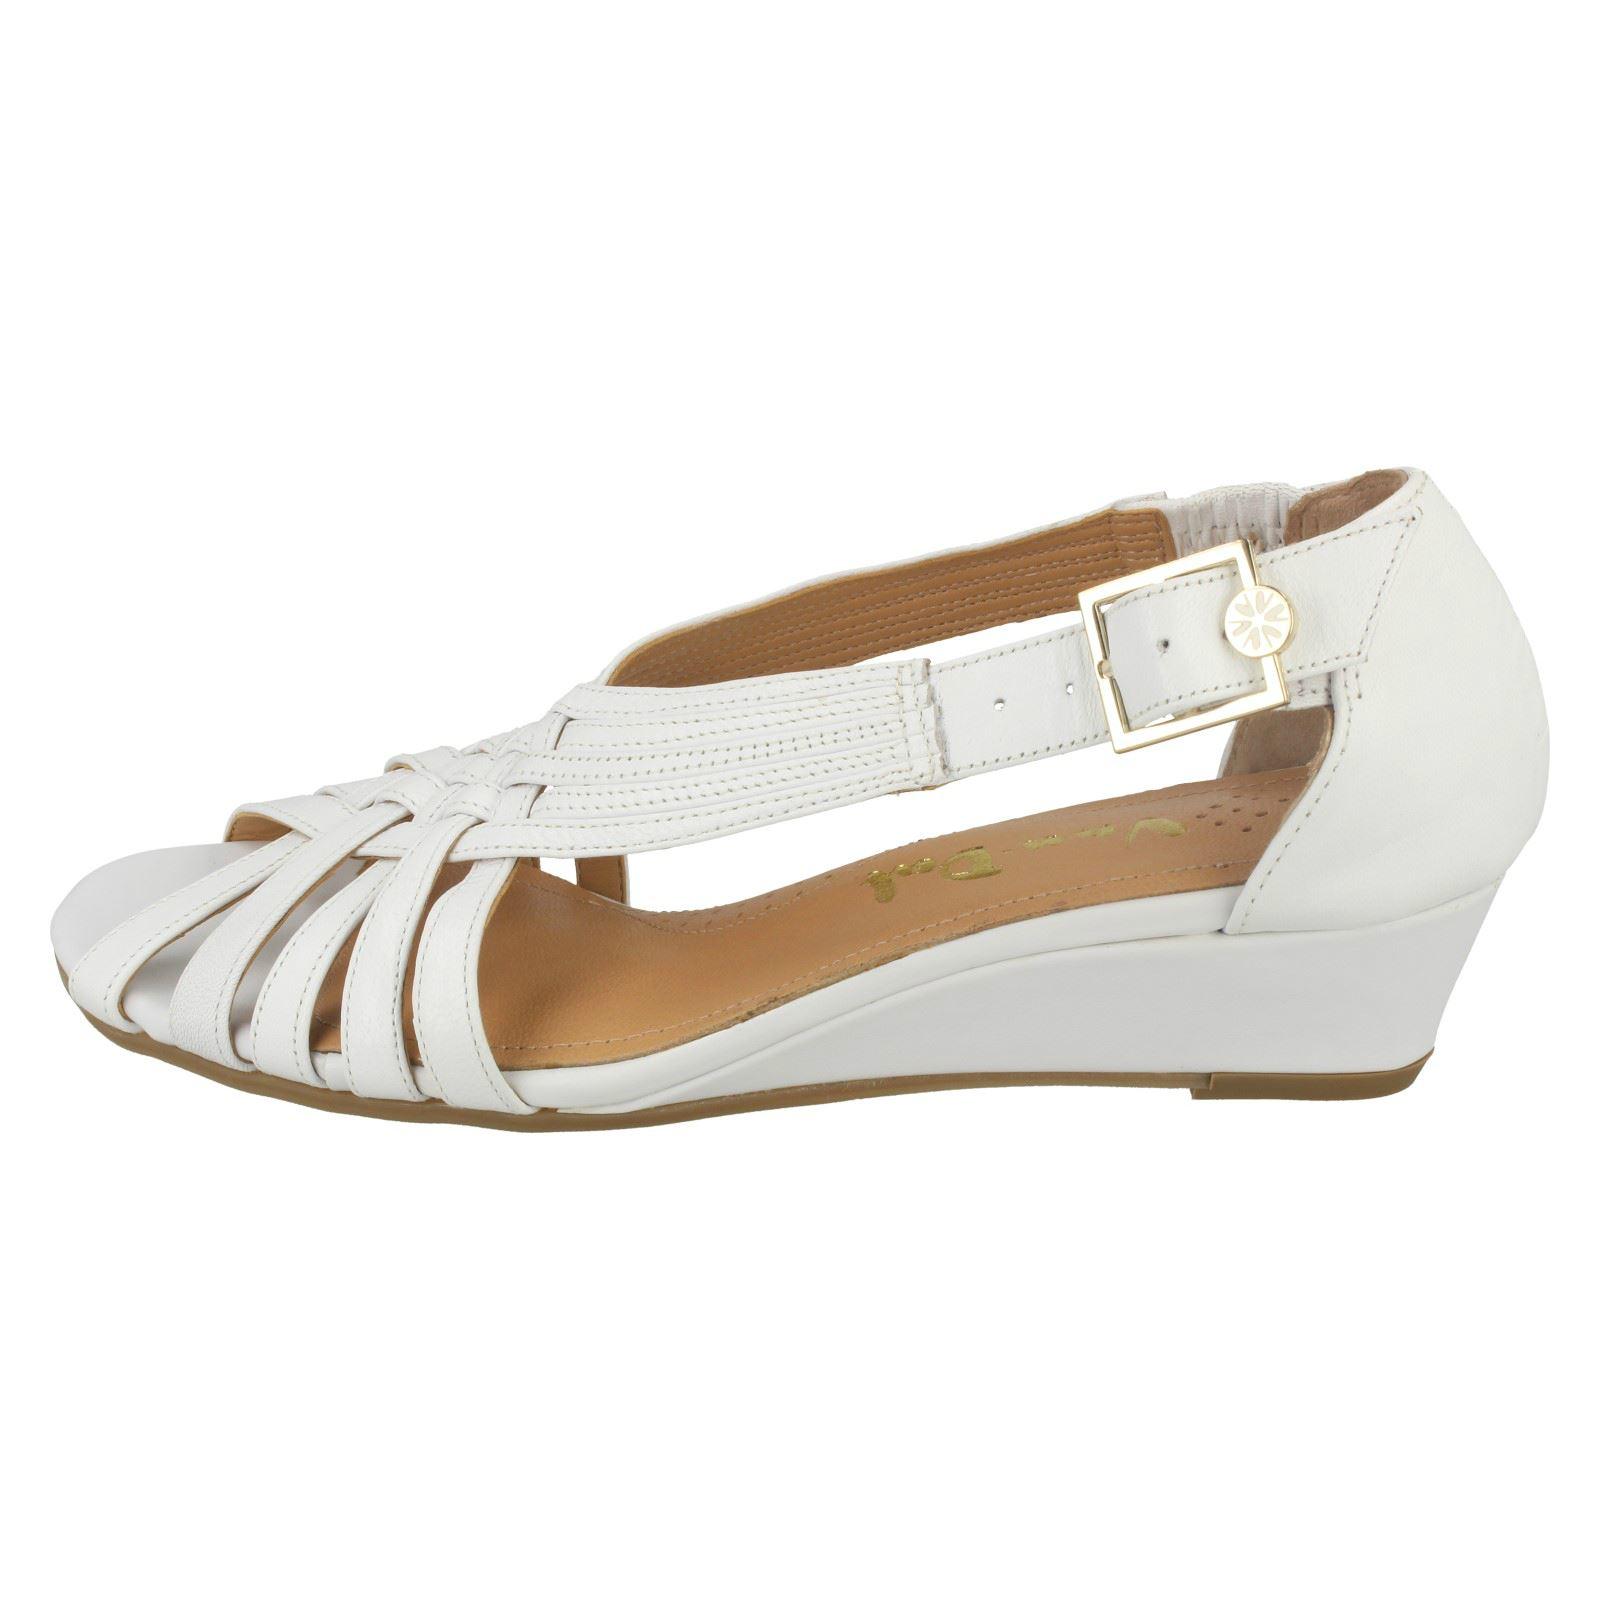 Ladies-Van-Dal-Wedge-Strappy-Sandals-Lucie thumbnail 17